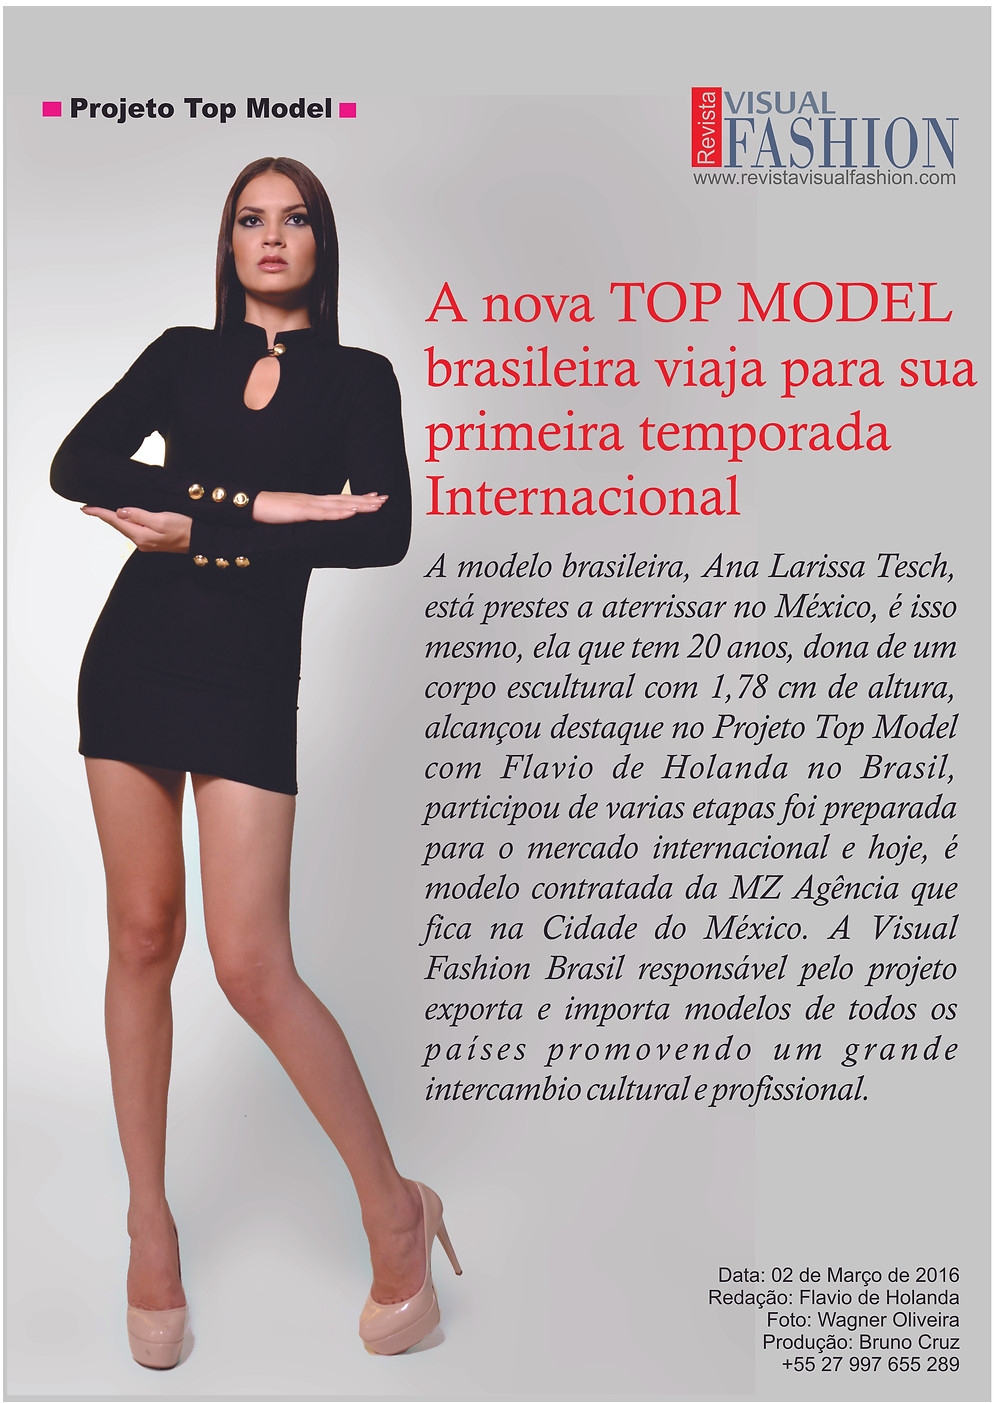 # projeto top mpdel ana Larissa Tesch    assessoria Flavio de Holanda  Visual Fashion Brasil